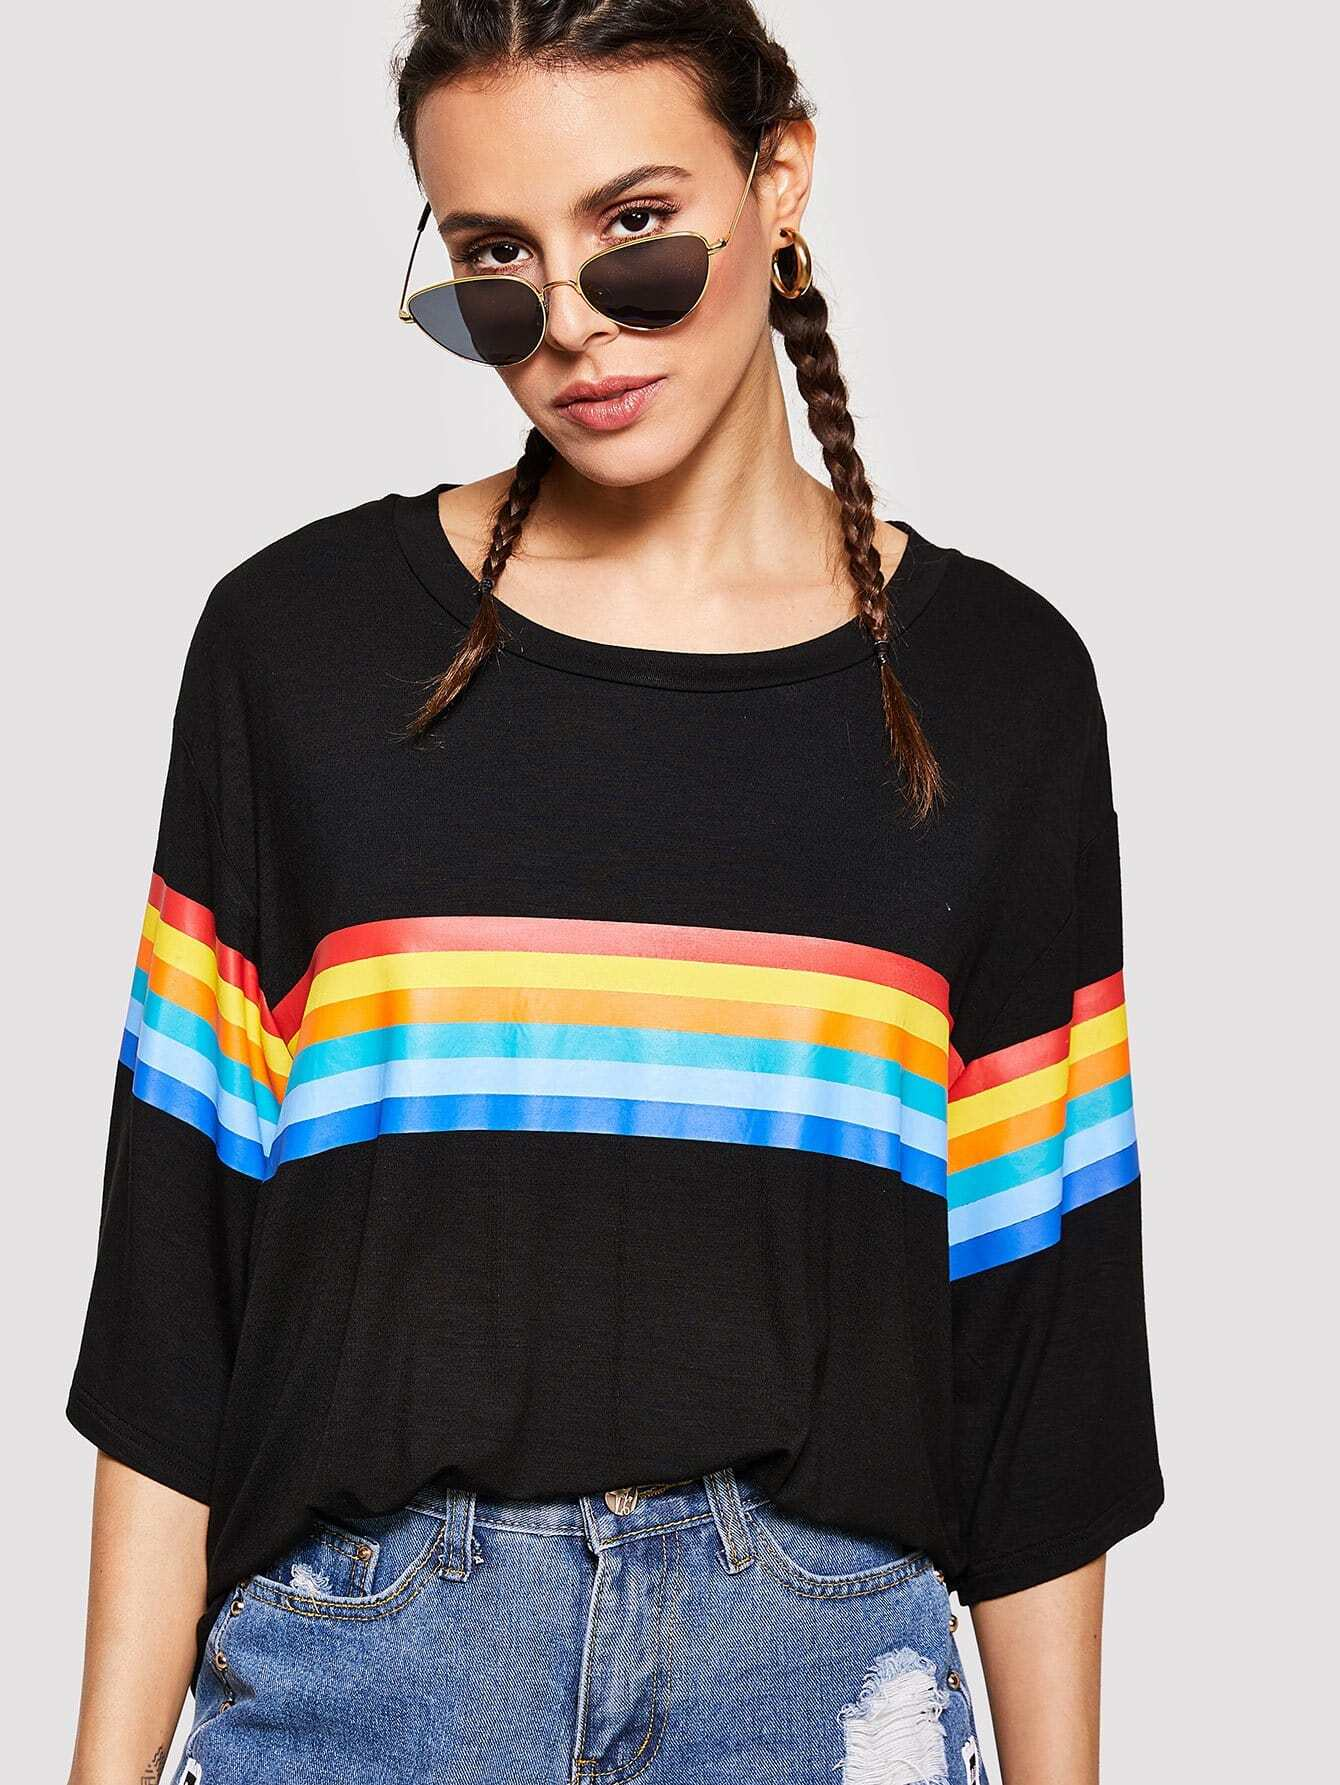 Drop Shoulder Rainbow Stripe Boxy Tee two tone drop shoulder sweatshirt